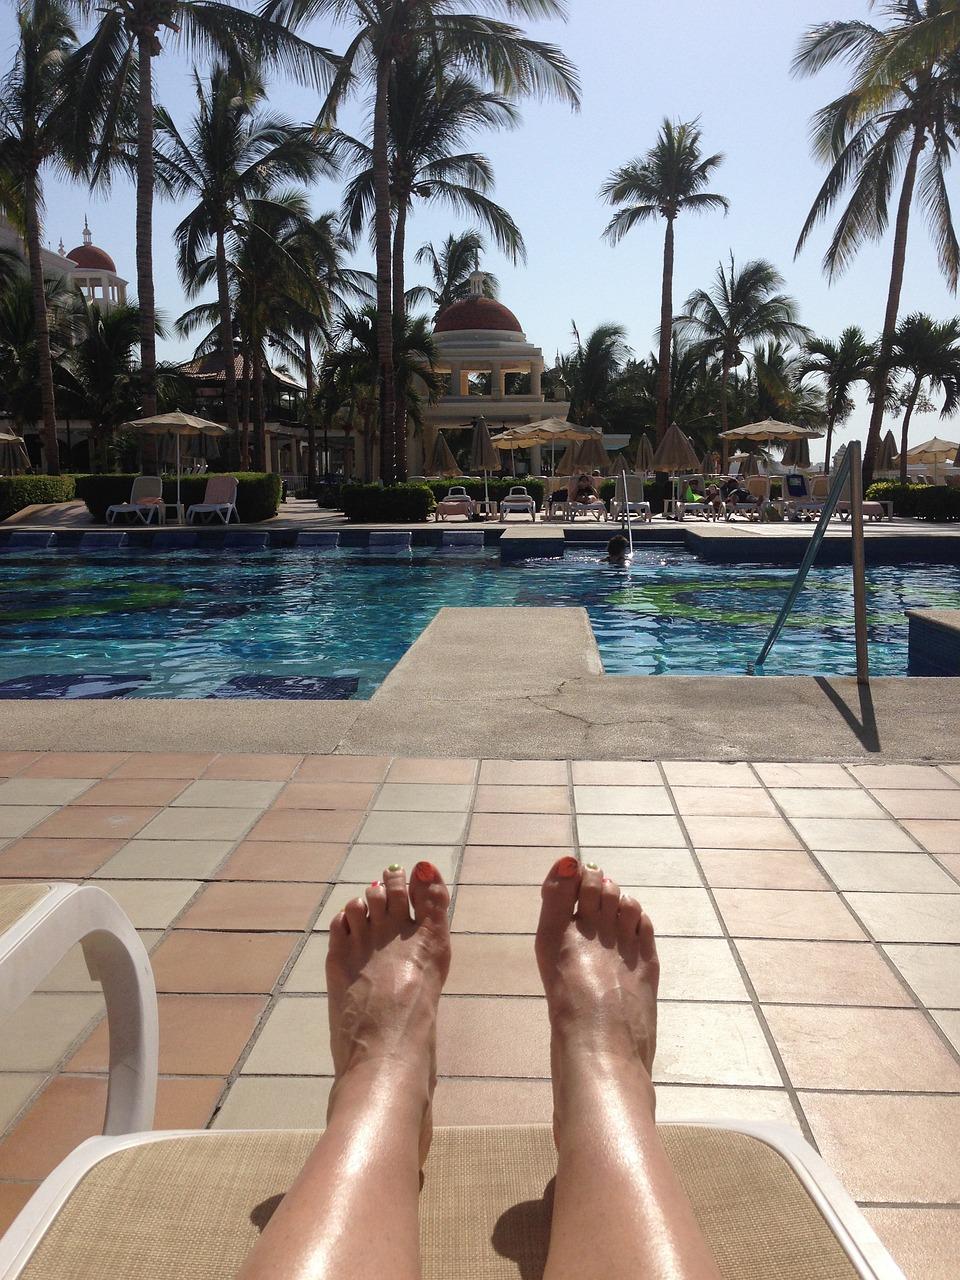 ножки у бассейна фут какой-то момент